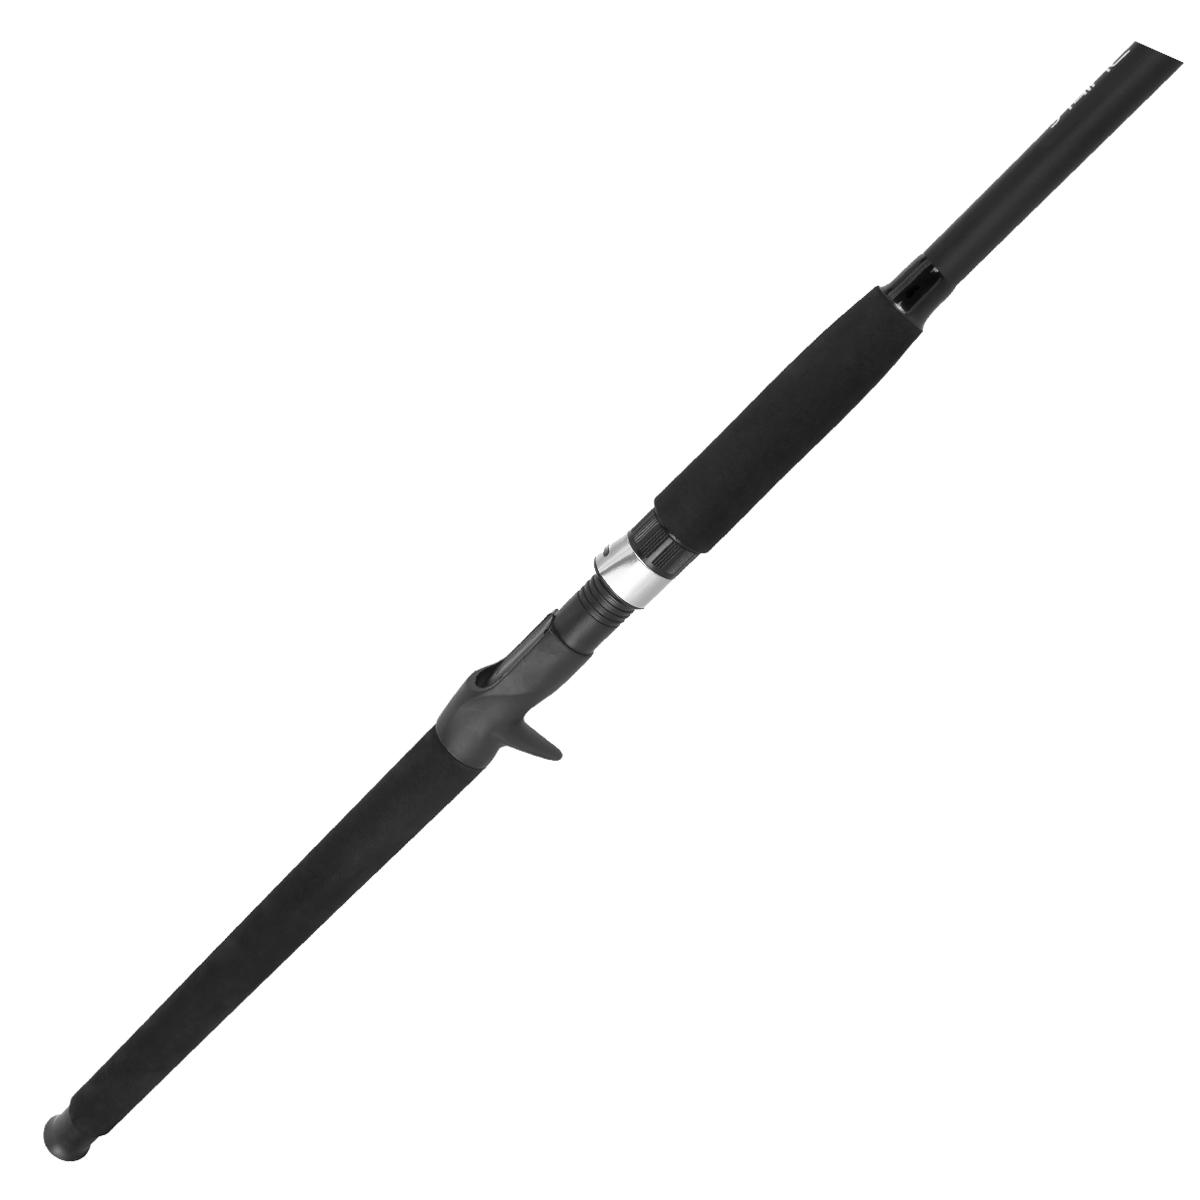 Vara Saint Hard Line P/ Carretilha 2,70 m 40 lbs (2 Partes)  - Pró Pesca Shop